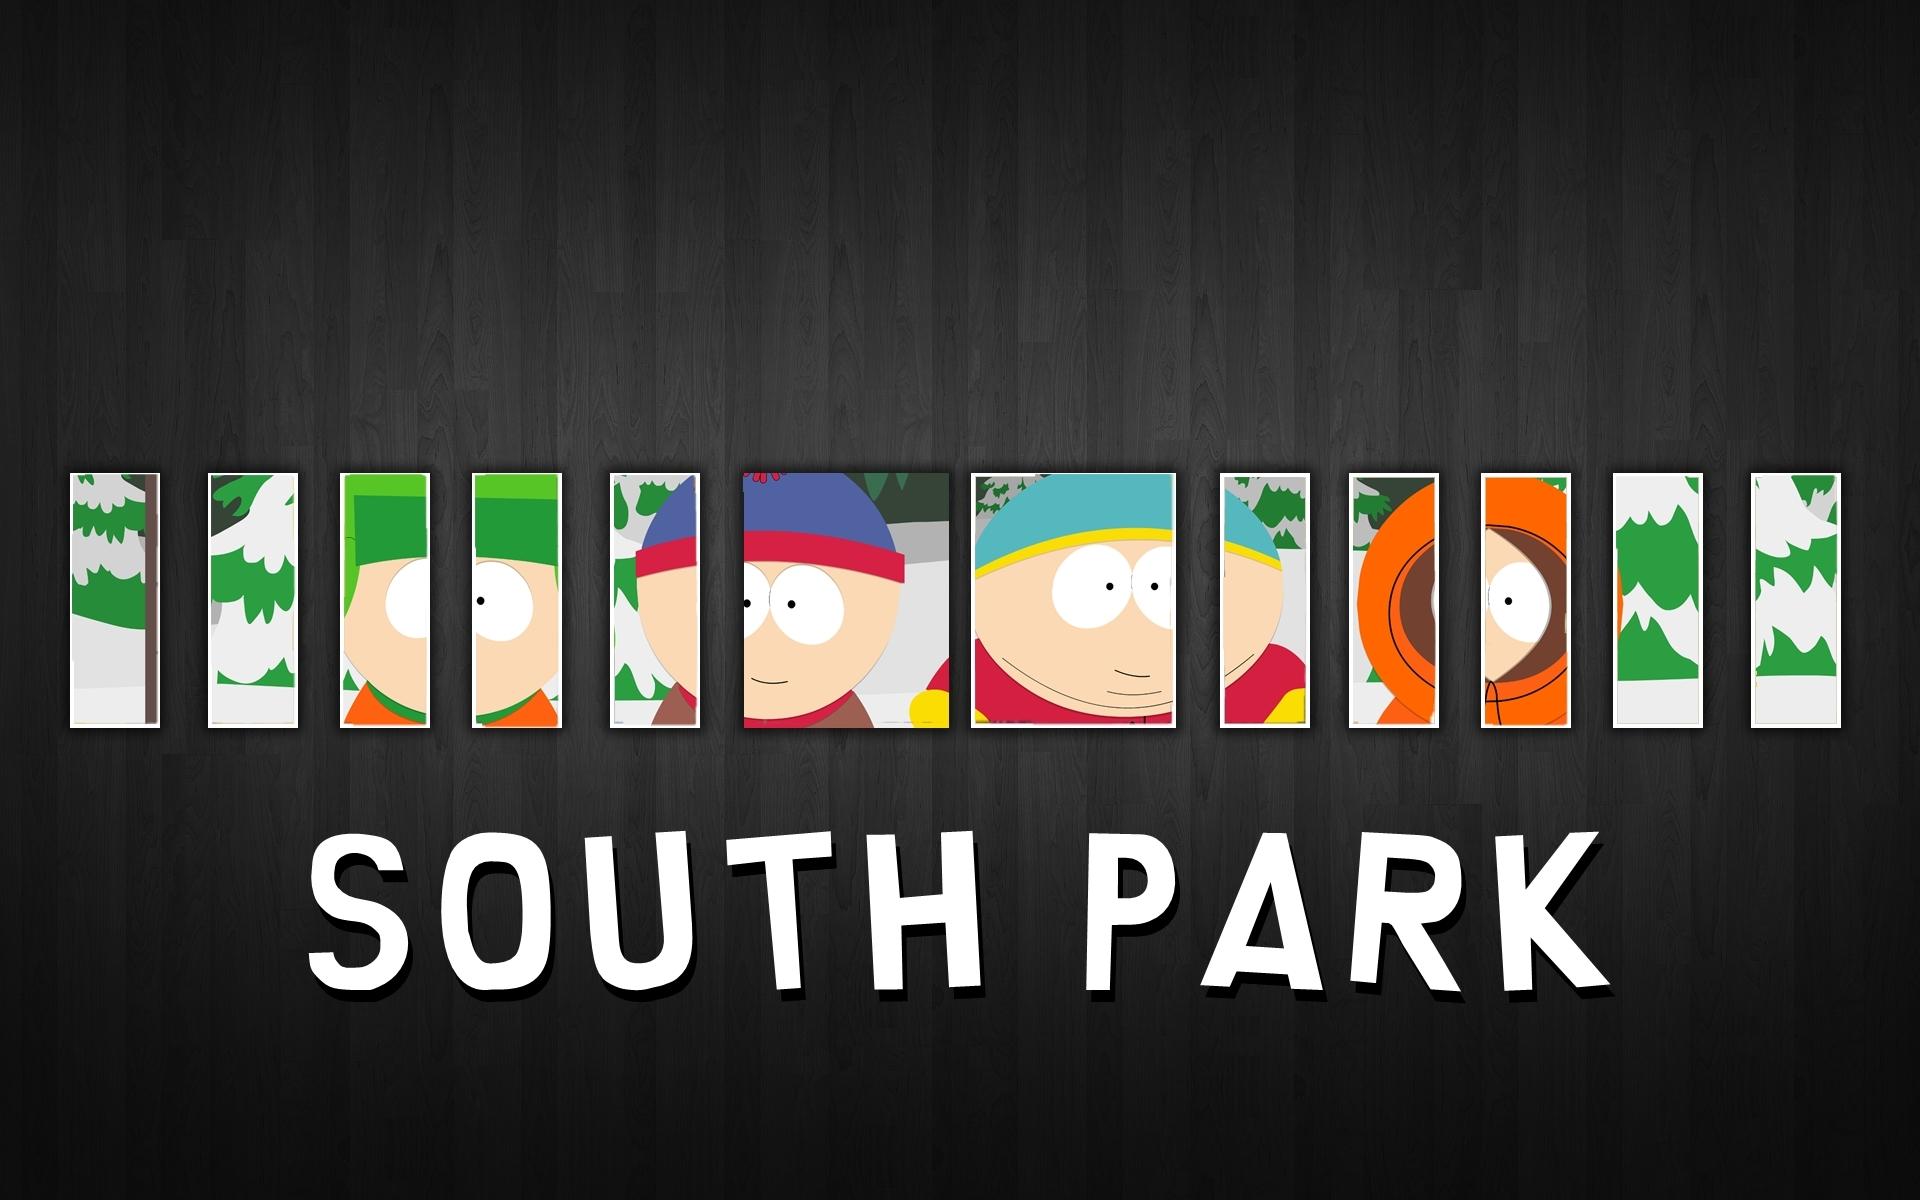 Eric Cartman Kenny Mccormick Kyle Broflovski South Park Stan Marsh 1920x1200